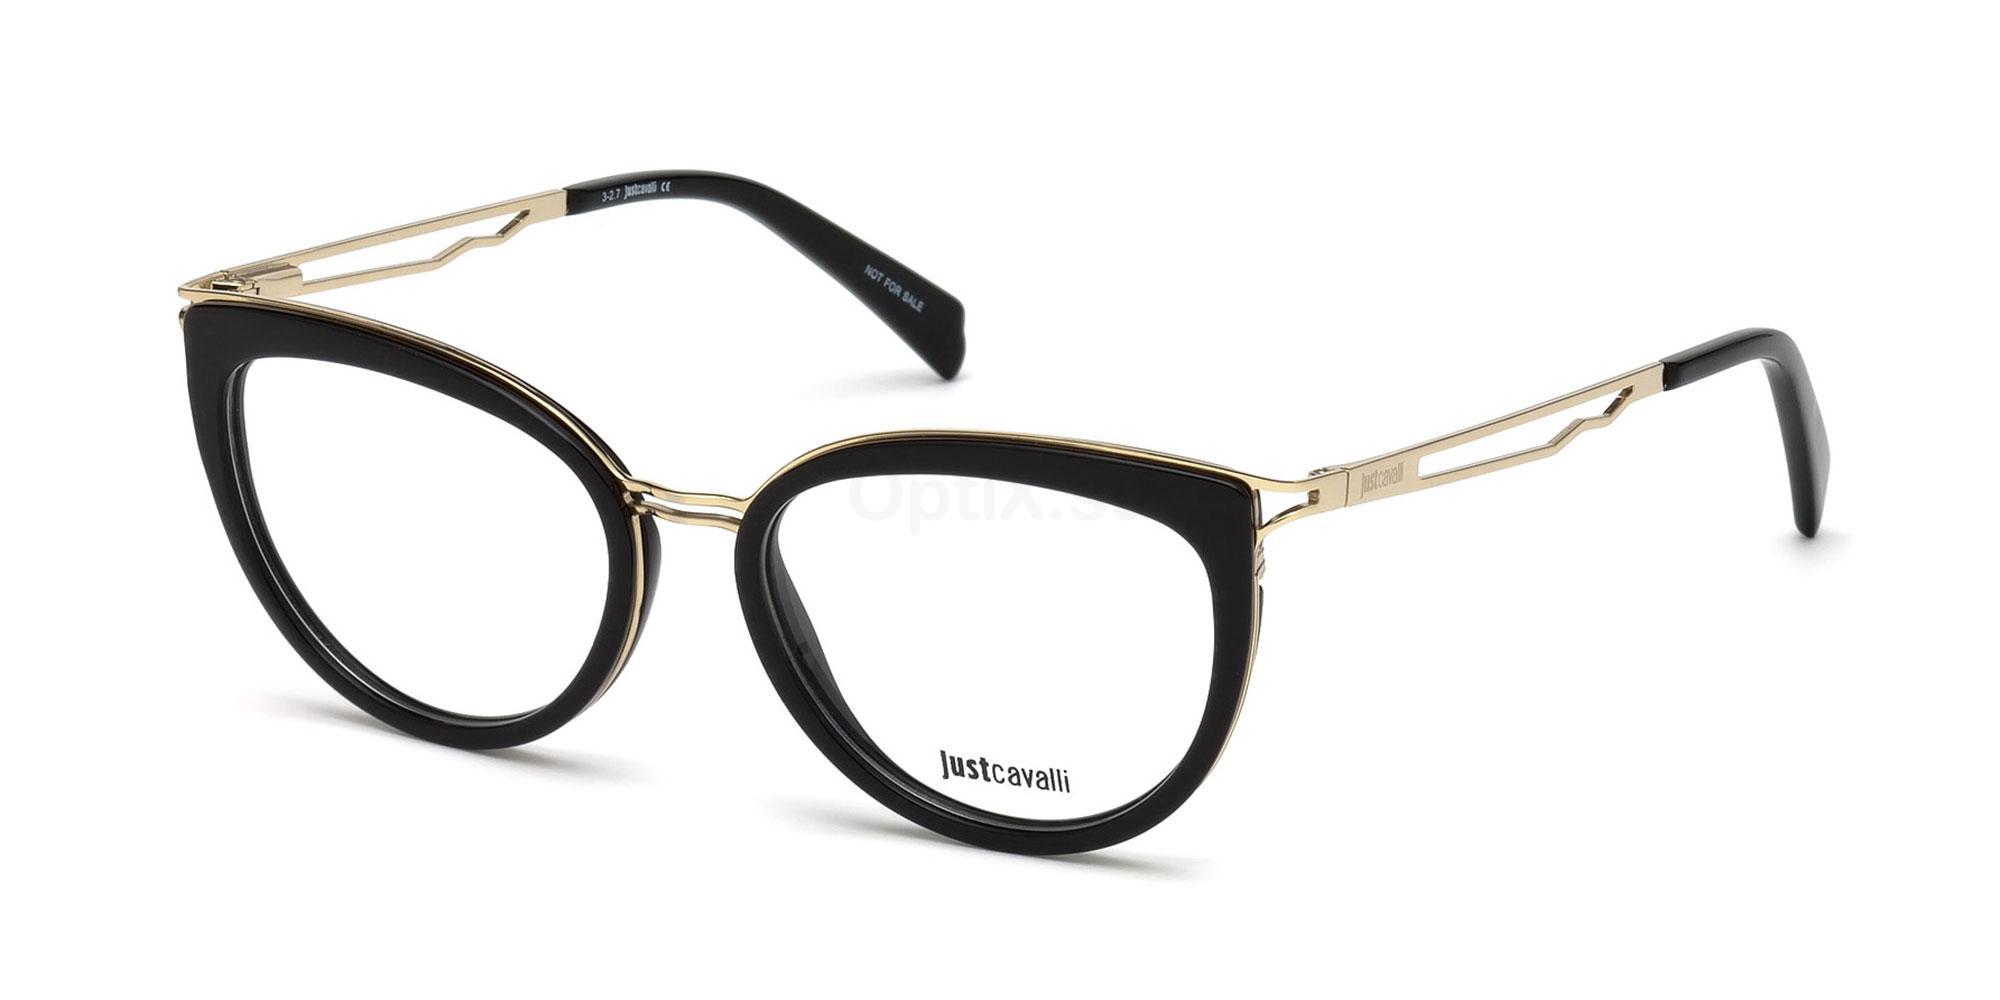 001 JC0857 Glasses, Just Cavalli